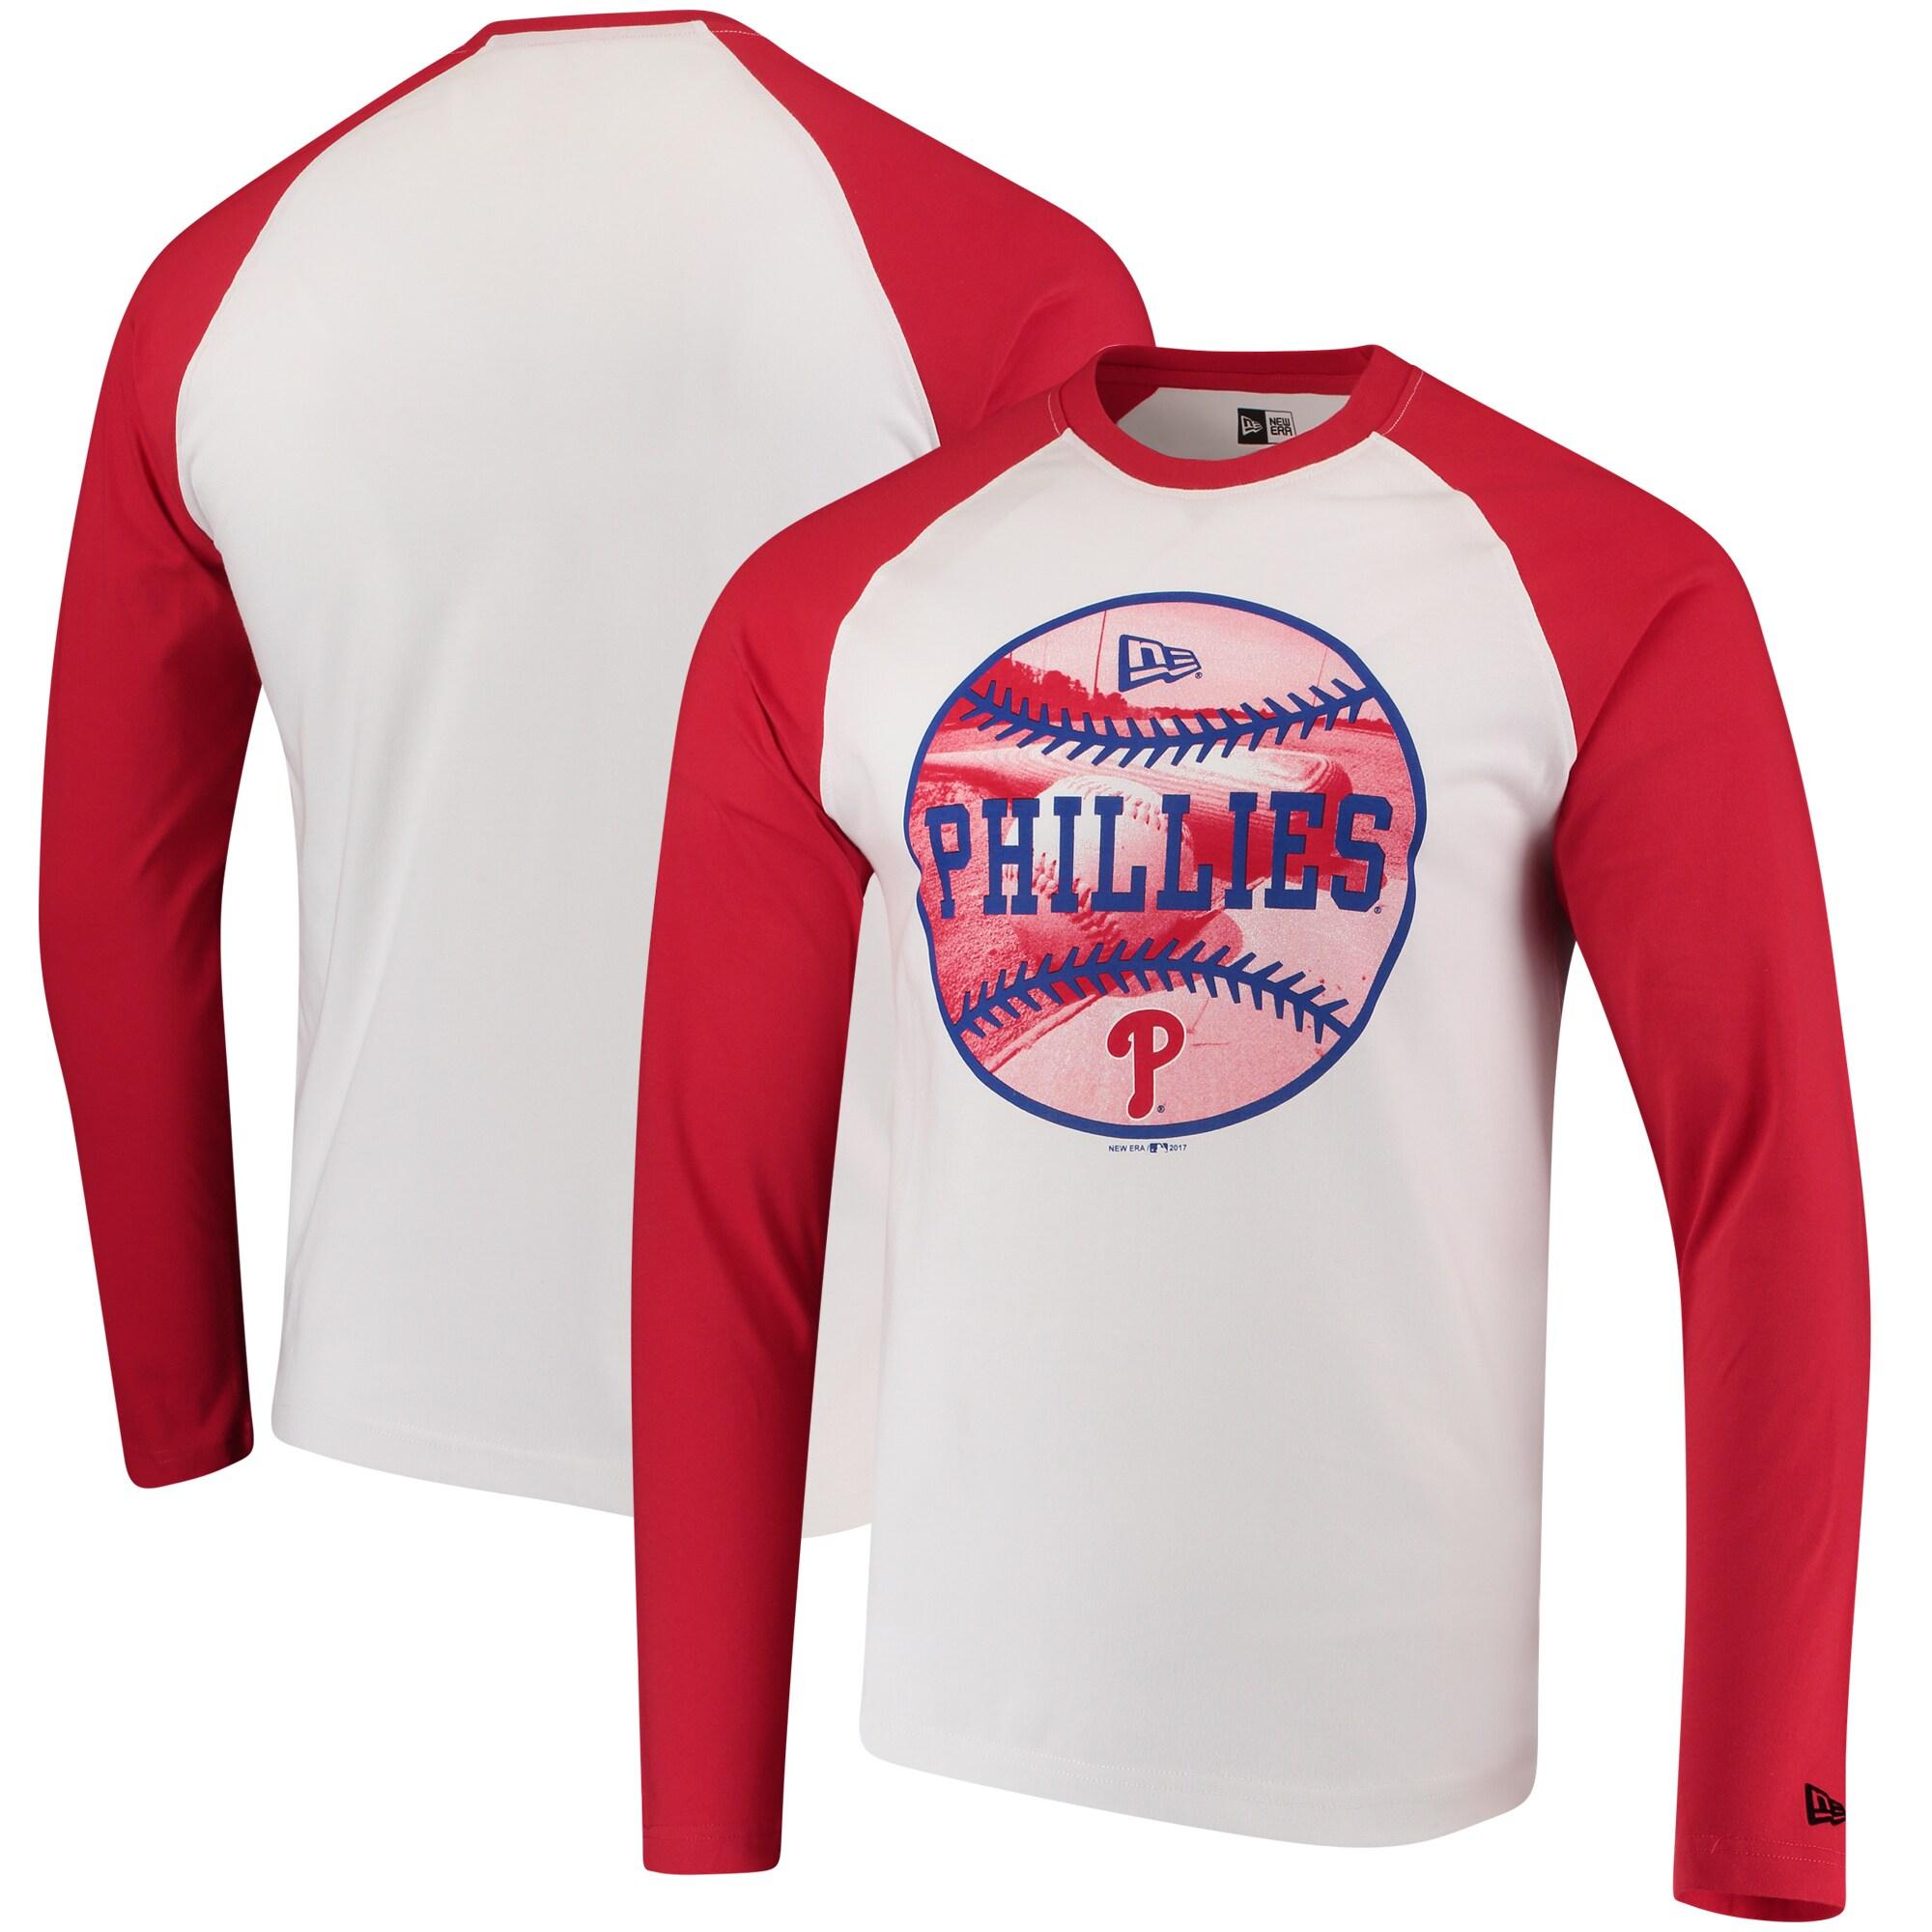 Philadelphia Phillies New Era Raglan Long Sleeve T-Shirt - White/Red